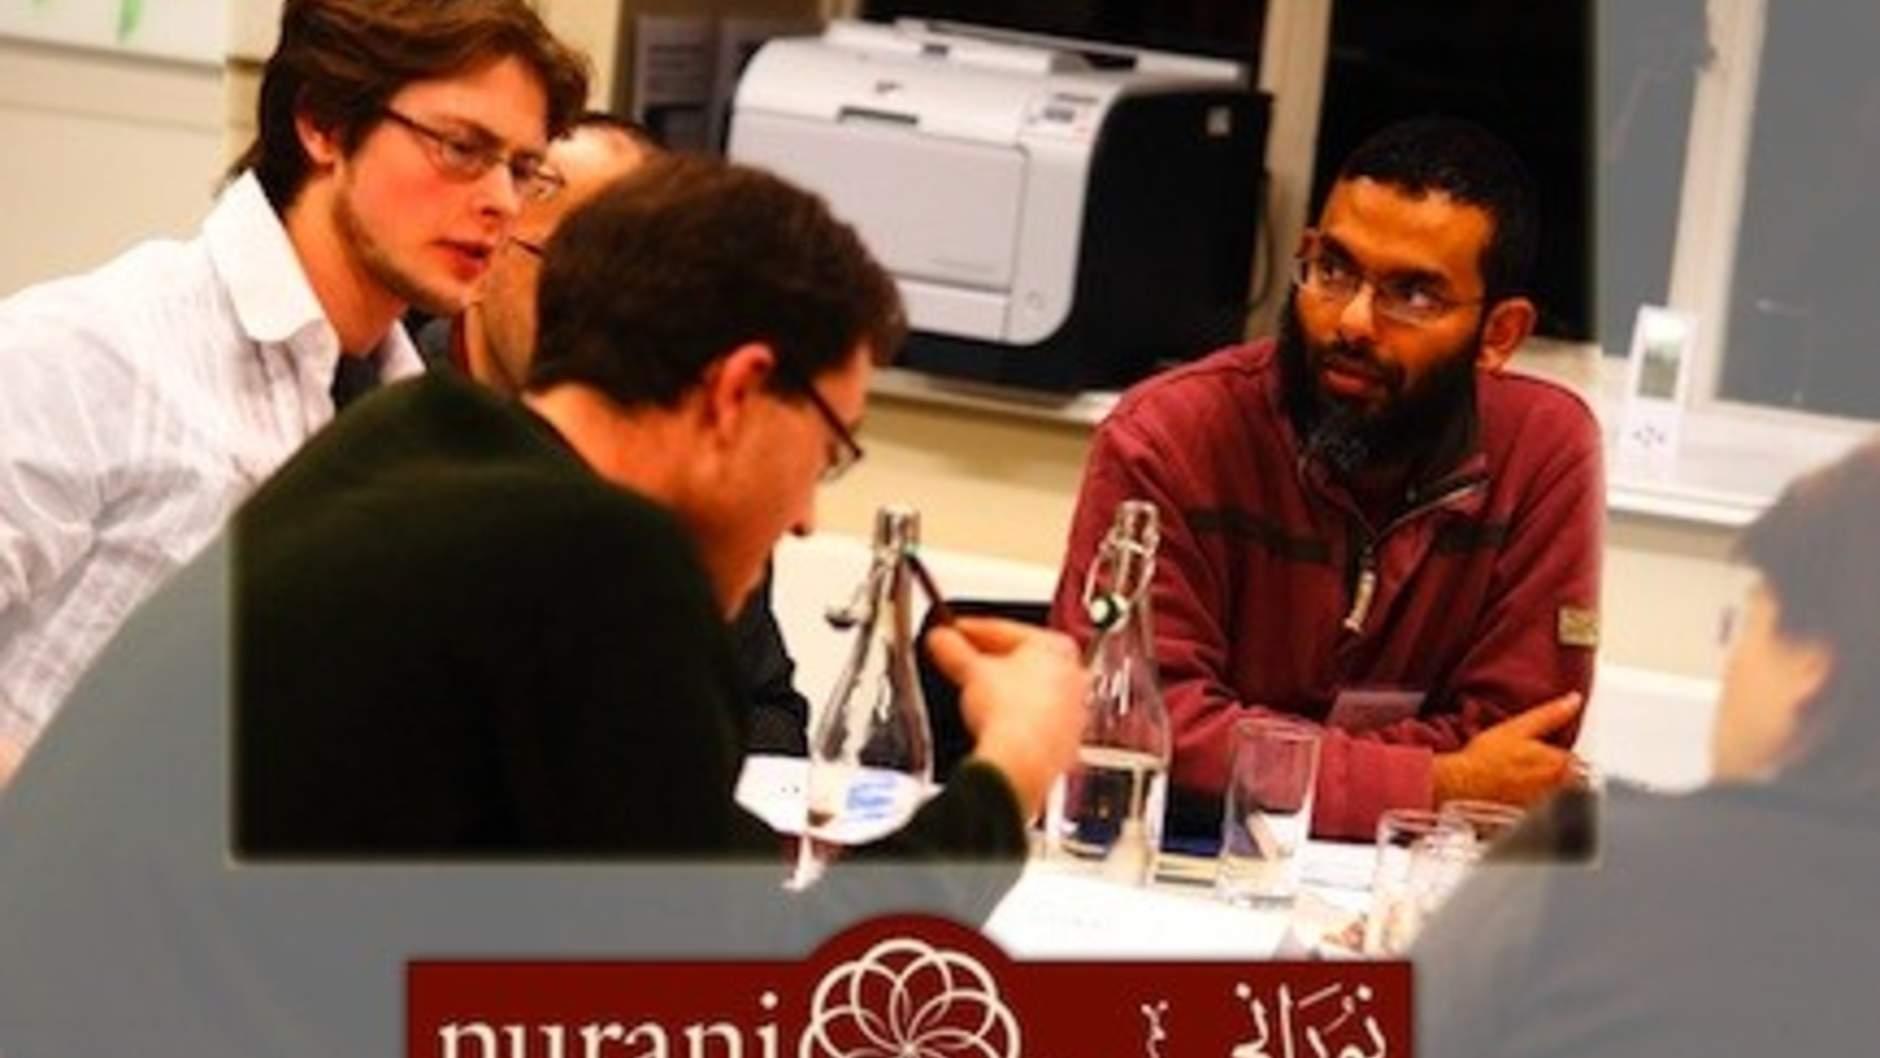 Coexist's Nurani project won prestigious grant